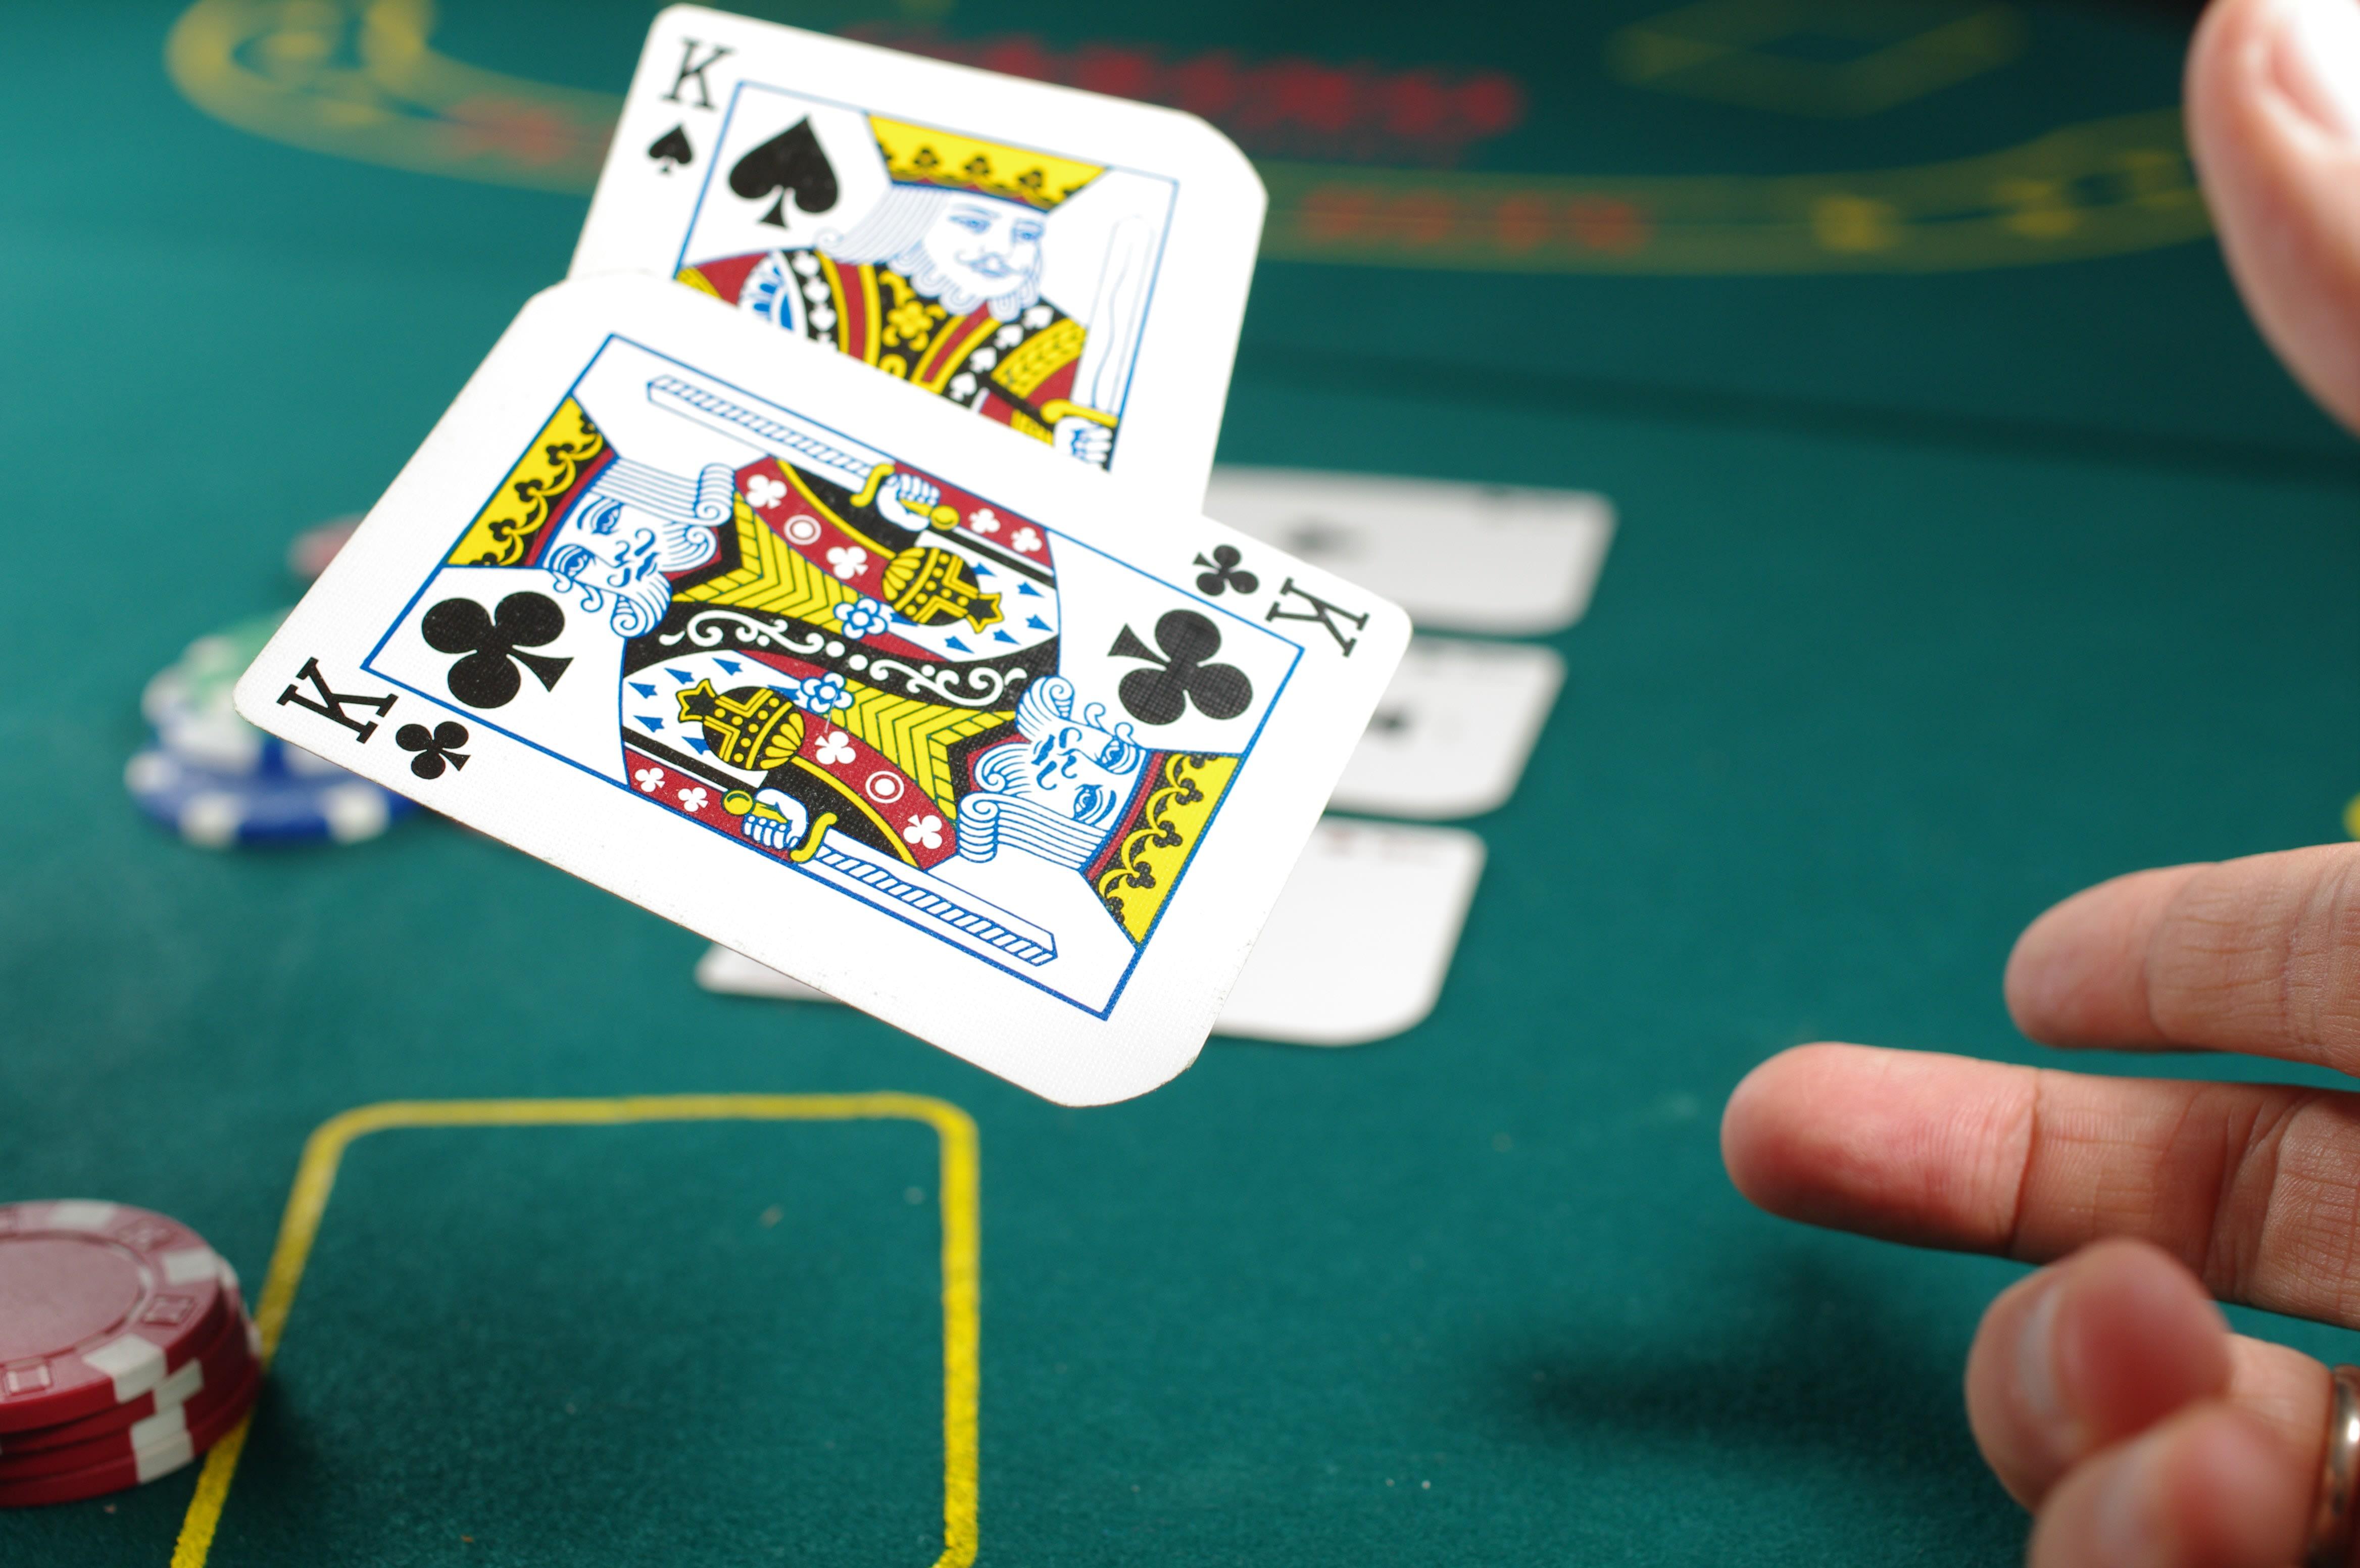 Ulasan Extreme Texas Hold'em (Evolution Gaming)